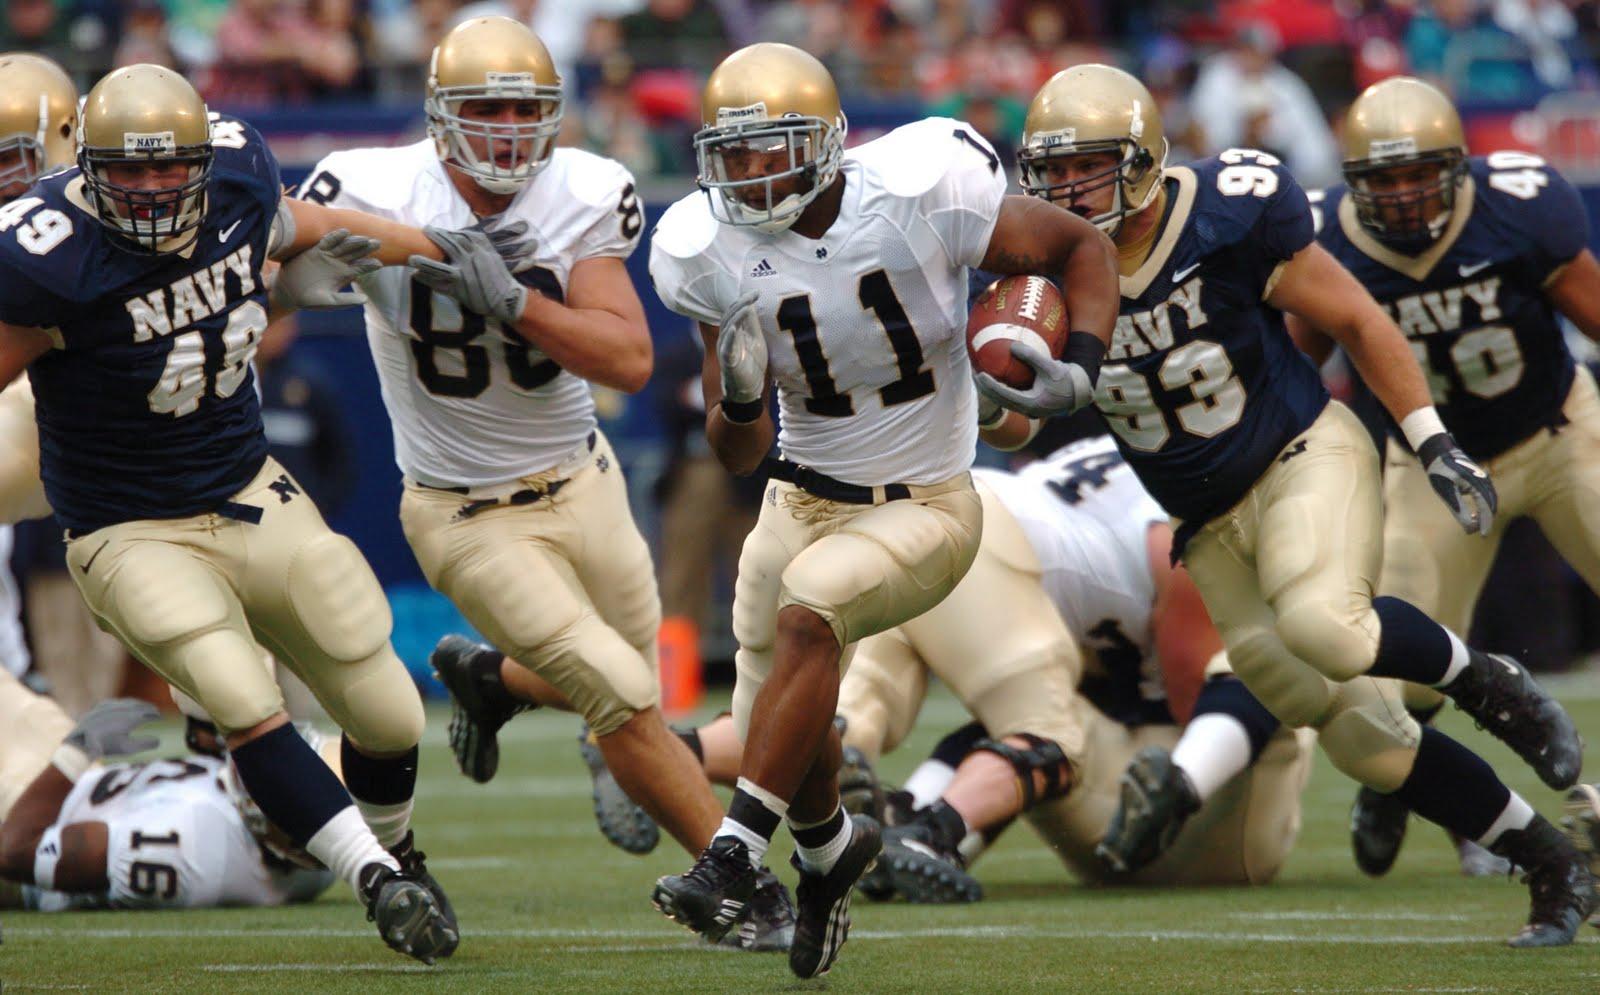 American Football Games: La Motte's Blog: AMERICAN FOOTBALL